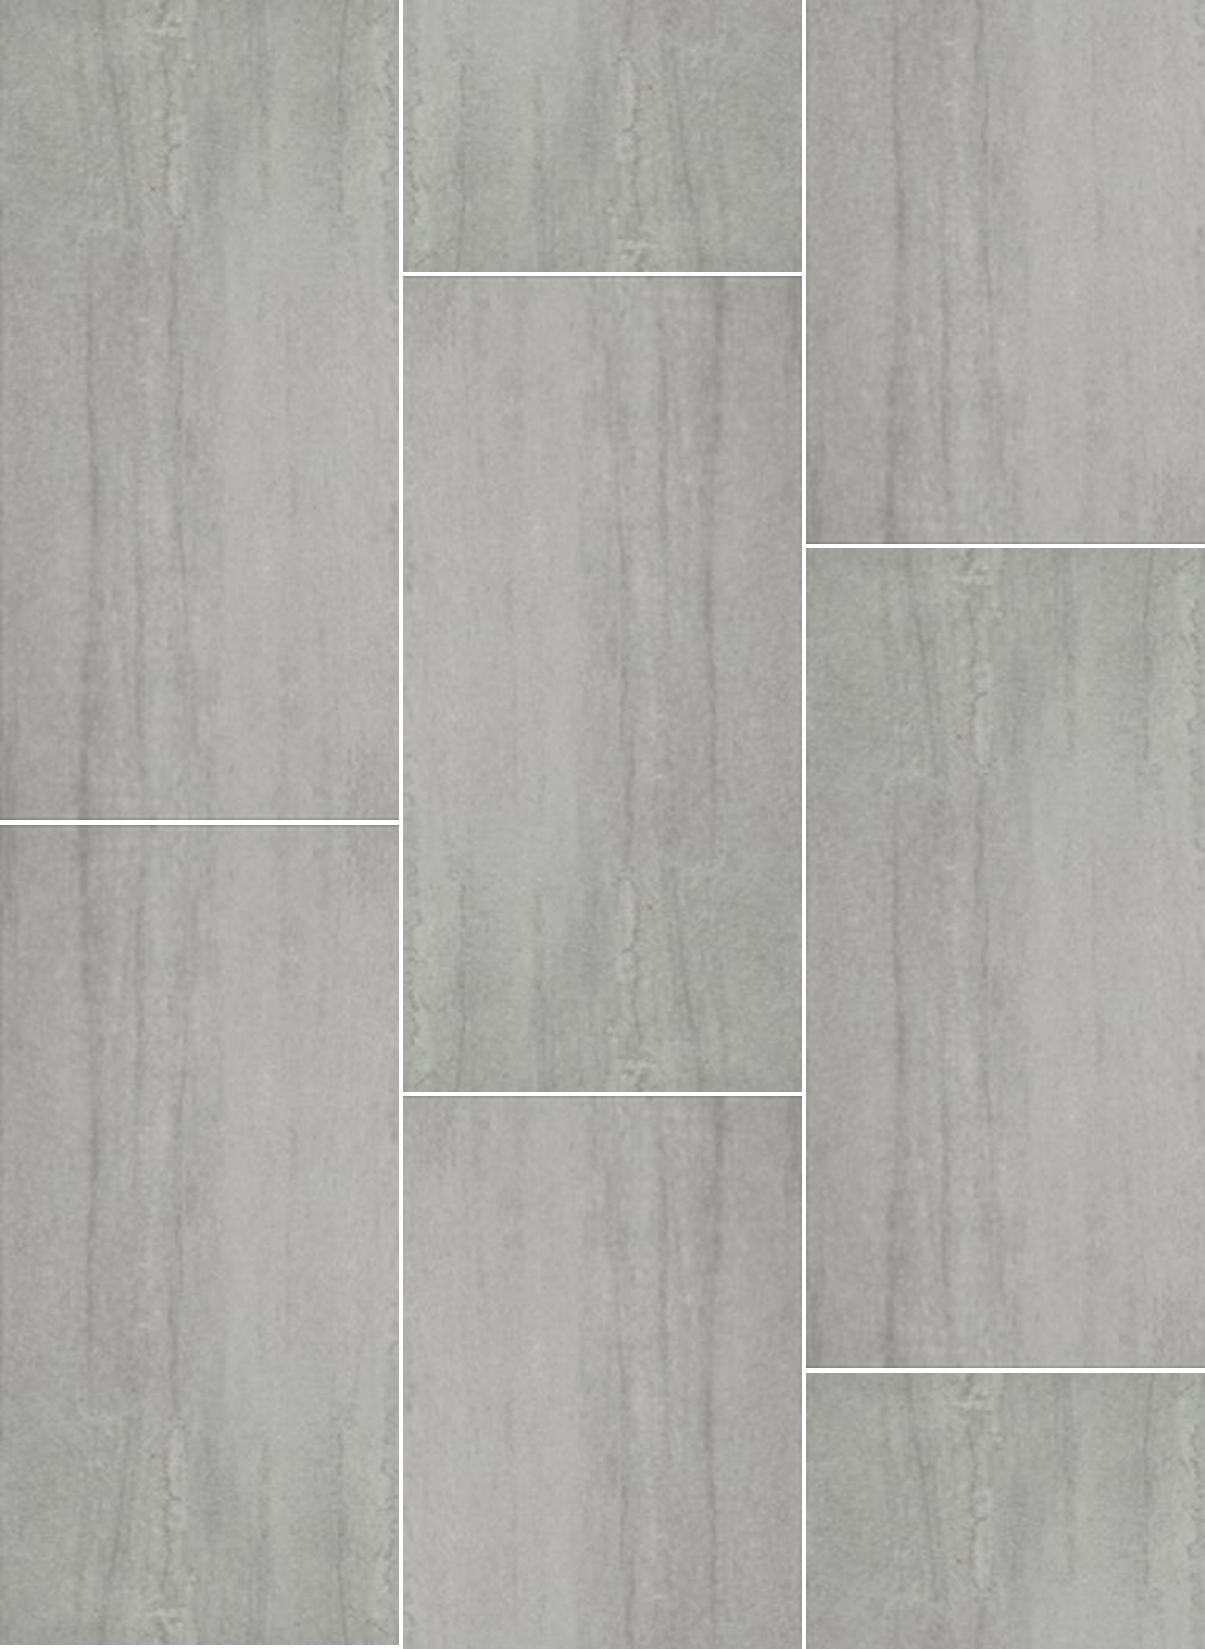 Free photo: Ceramic tiles texture - Angles, Ceramic, Dark ...